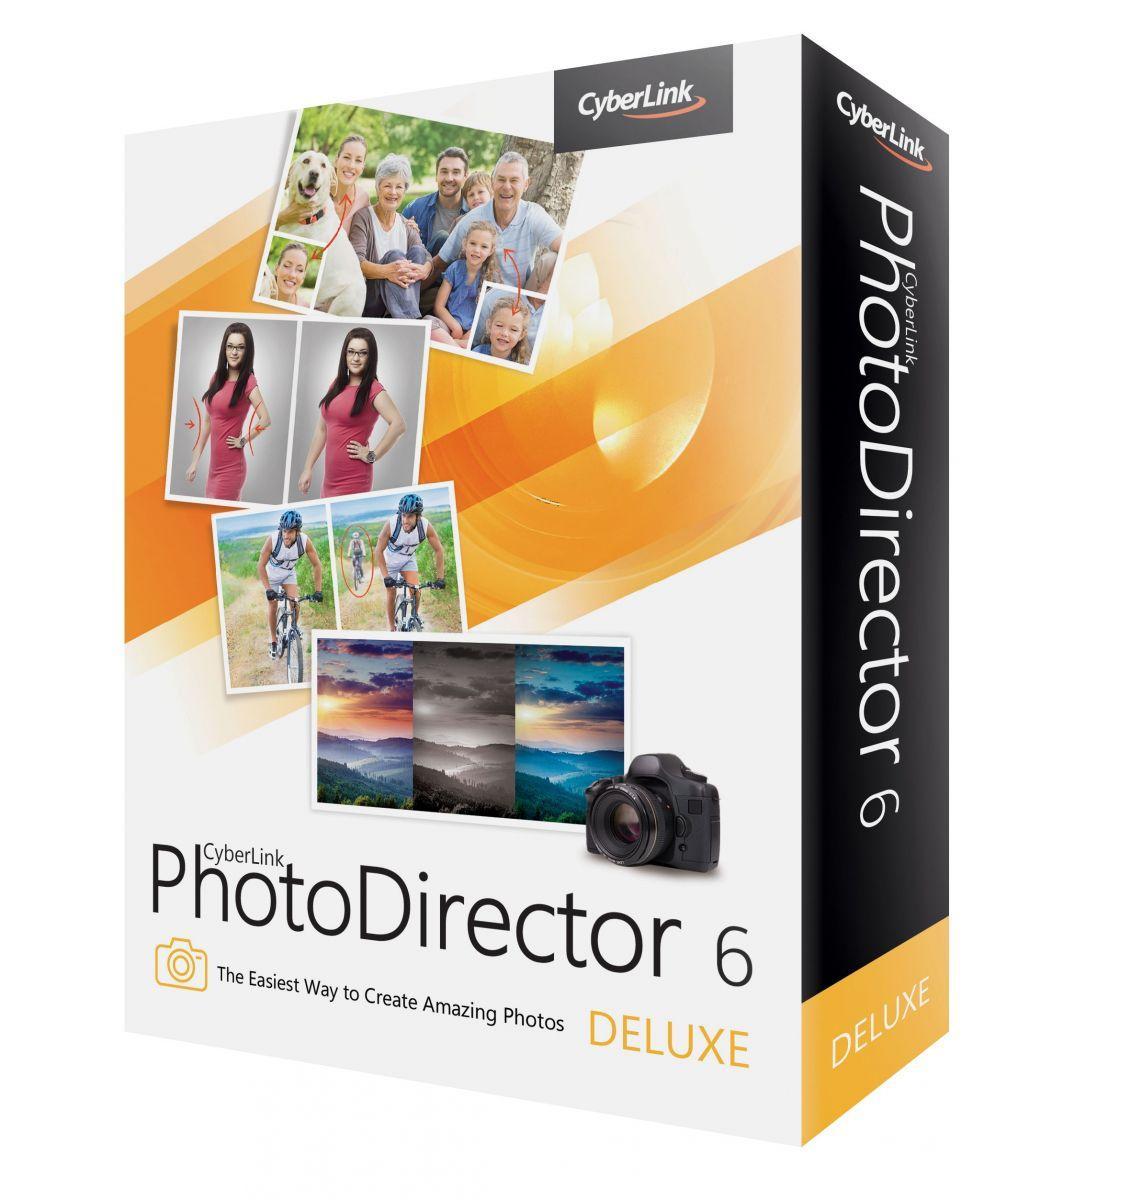 Logiciel CyberLink PhotoDirector 6 Deluxe gratuit (au lieu de 49.99€)